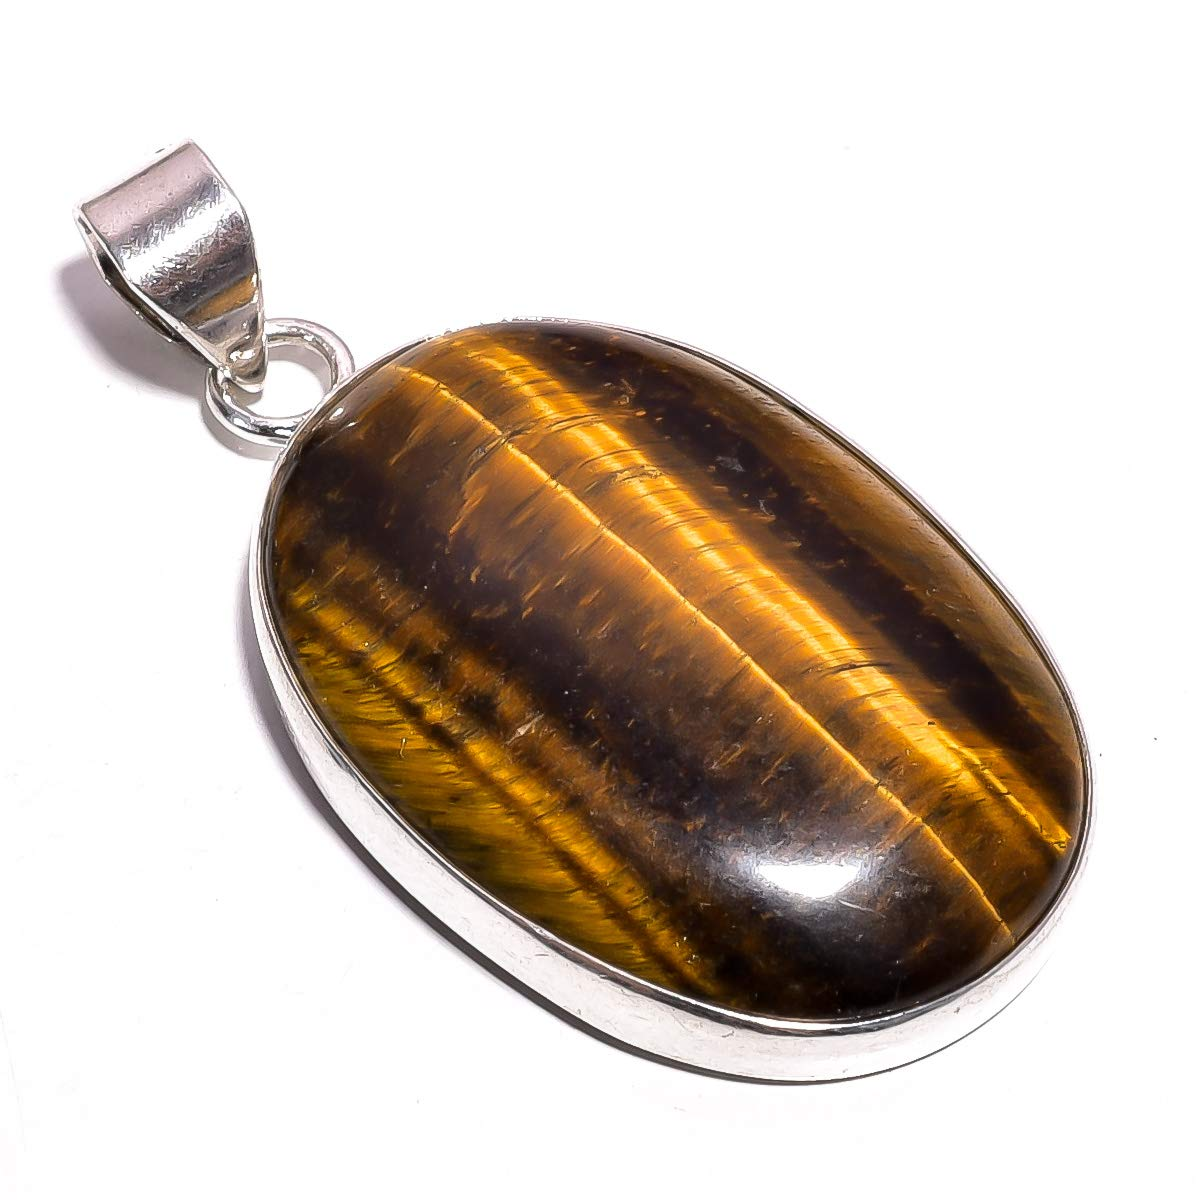 Mughal Gems /& Jewellery 925 Sterling Silver Pendant Natural Tiger Eye Oval Gemstone Ethnic Style Handmade Jewelry for Women /& Girls Pendant 1.9 ZP-24